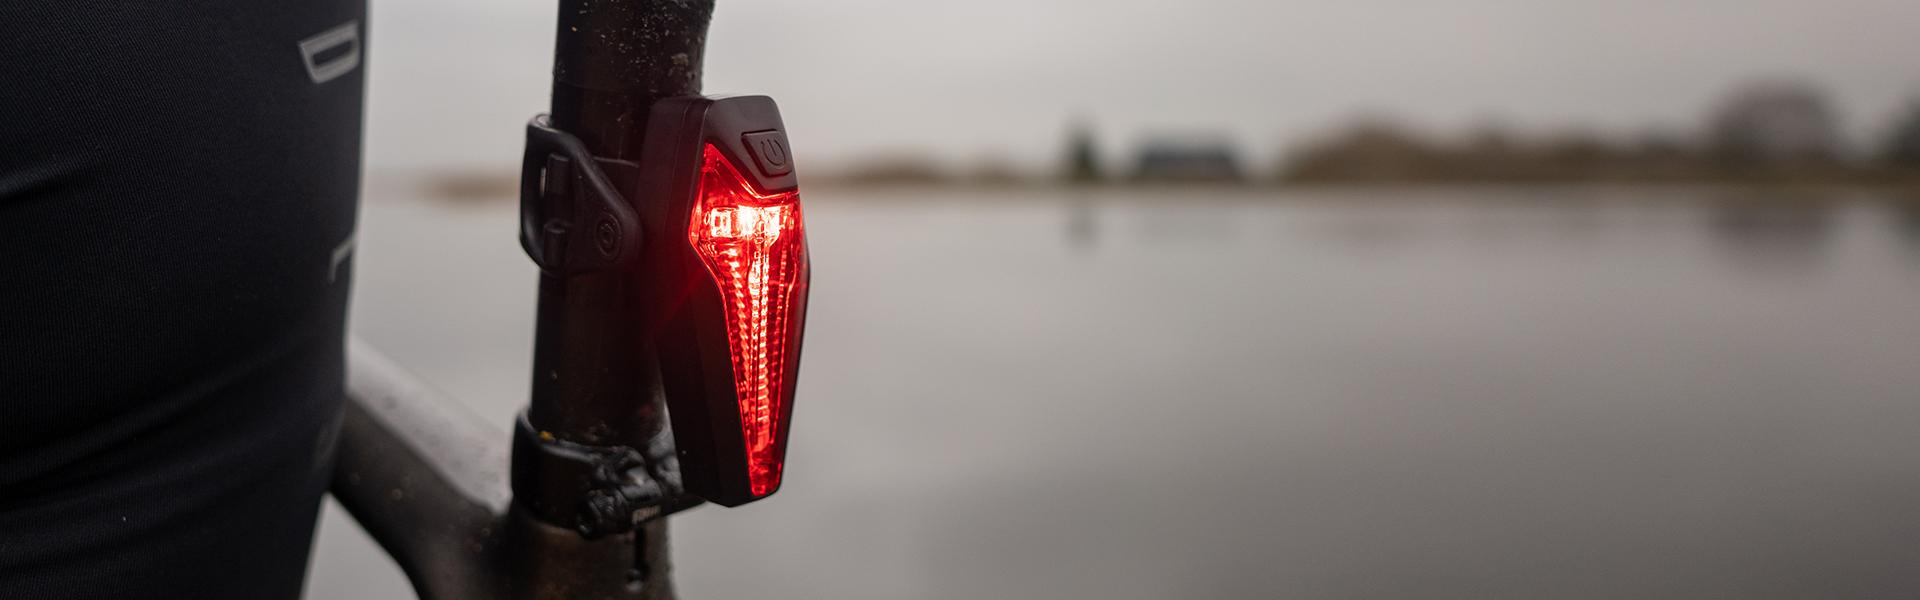 Sate-lite CREE ebike light  StVZO  eletric bike tail light with StVZO Z ECE Zreflector mount on Carrier 6-48V